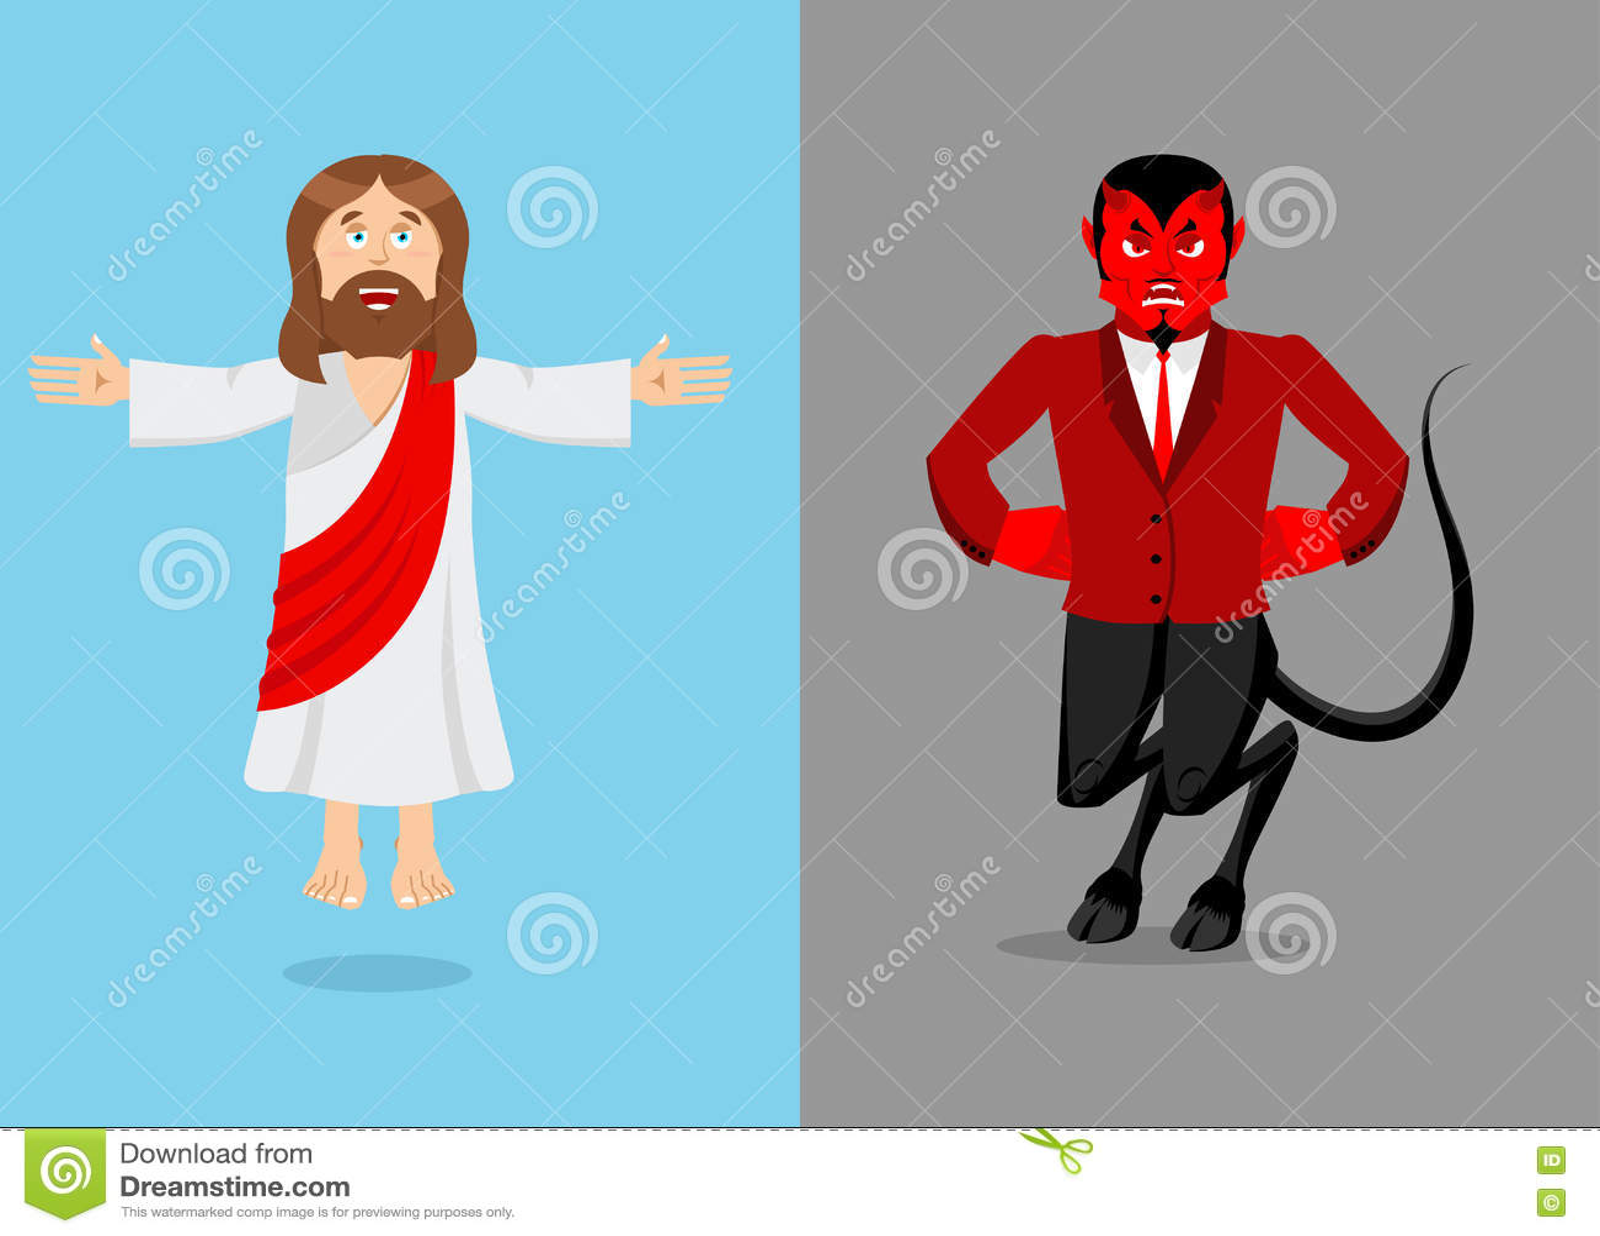 zoon van satan